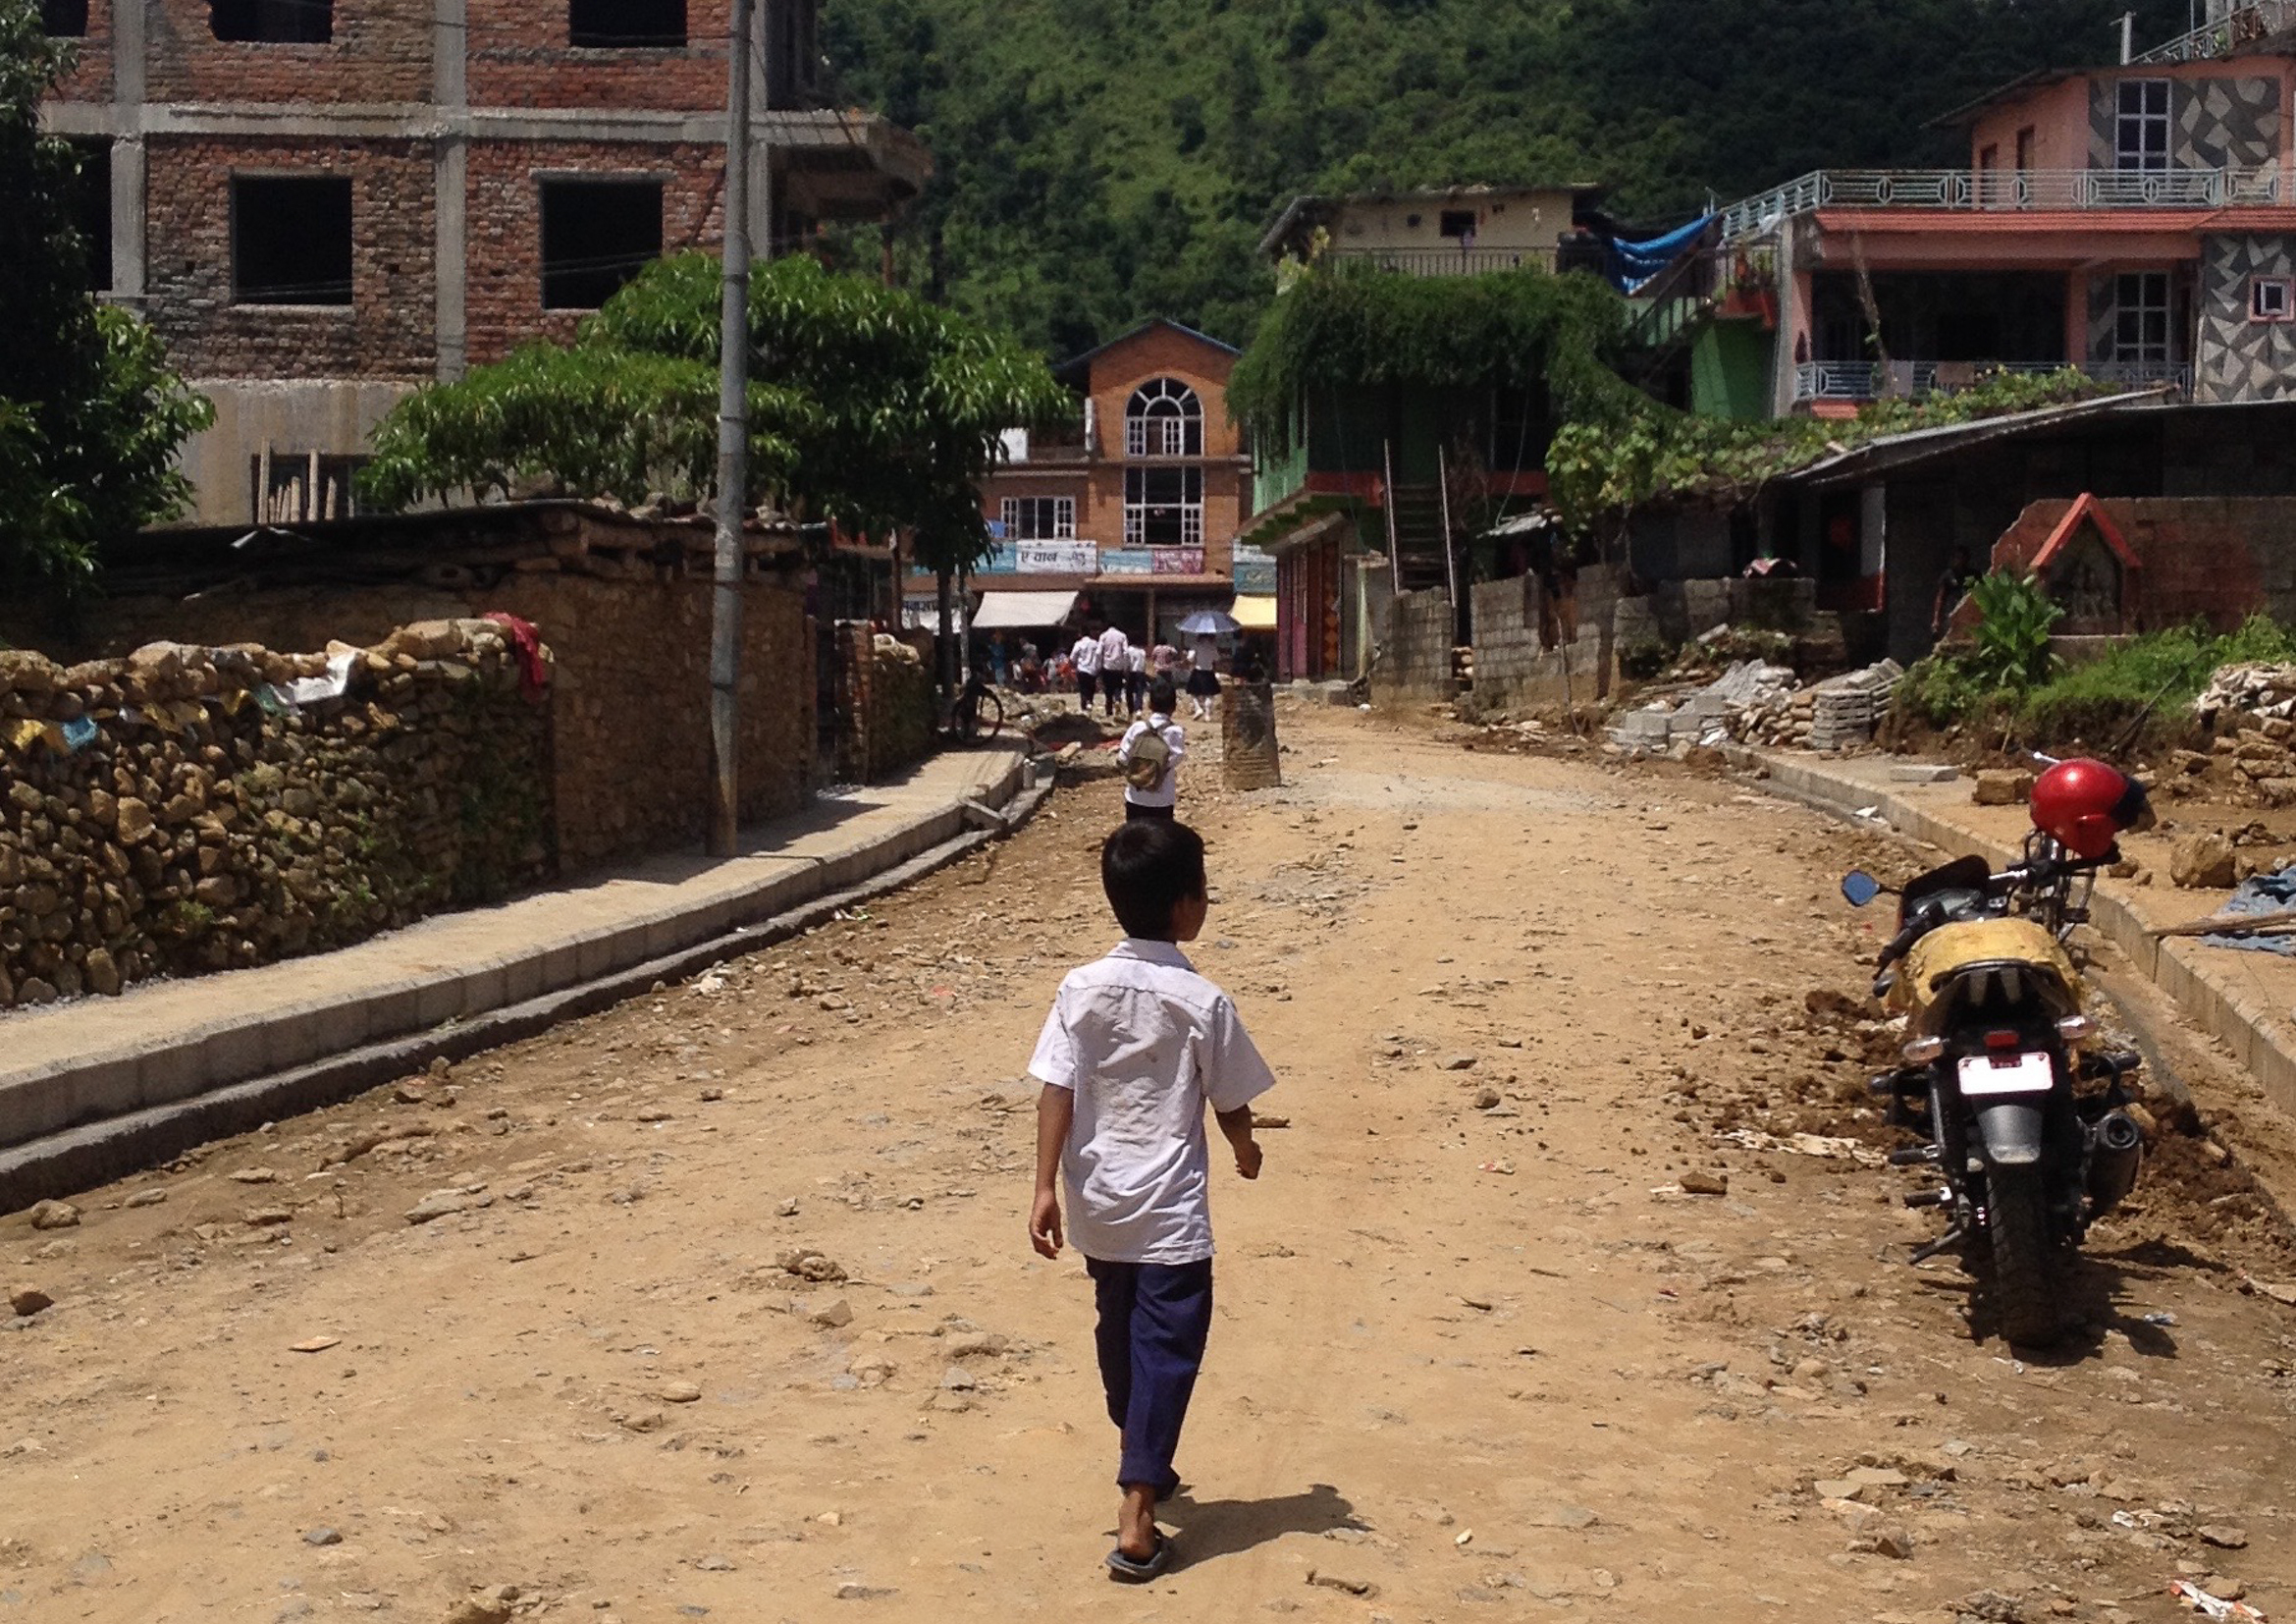 NEPAL-GLOBAL-SCHOOLING-BOY-ROAD-DIRT